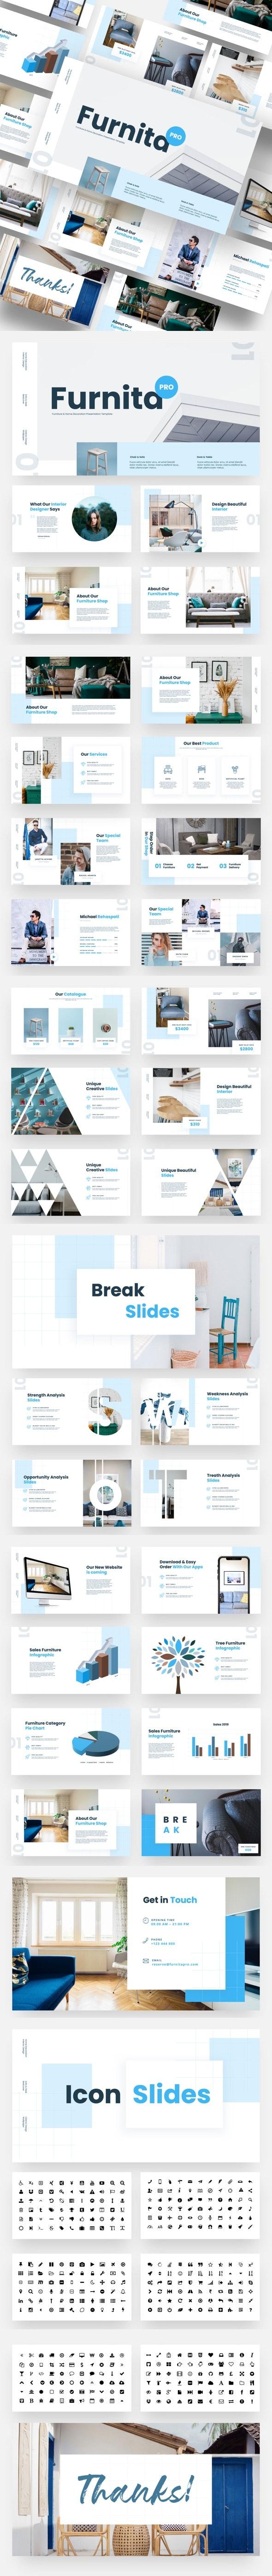 Furnita Pro - Furniture & Home Decoration Keynote Template - Business Keynote Templates